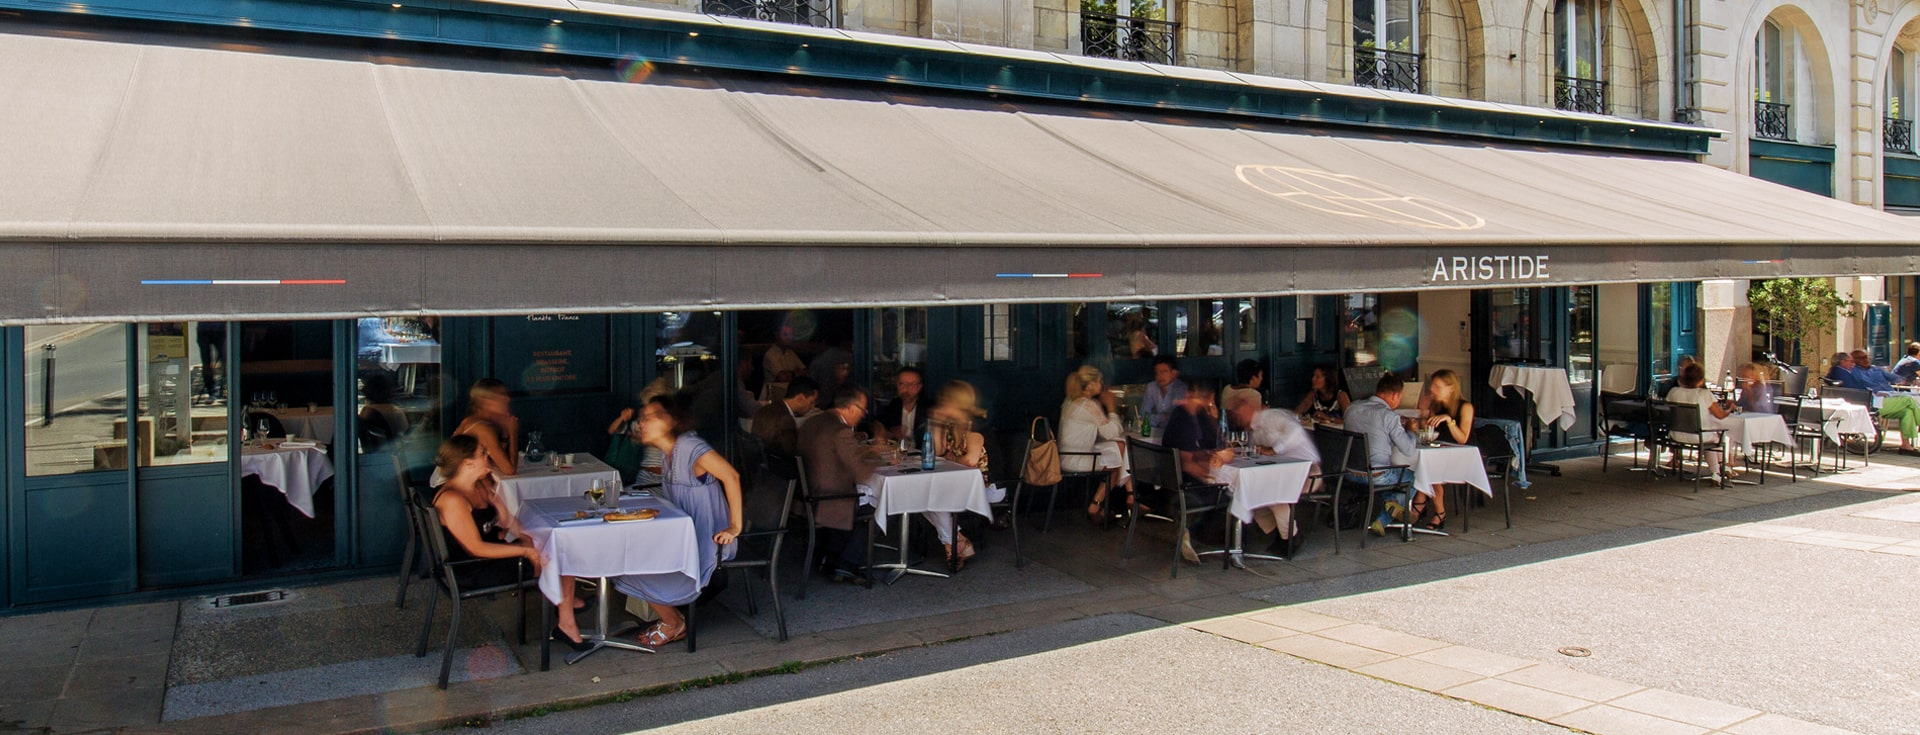 Store Banne Madrid - Aristide à Nantes (44) par Espacio